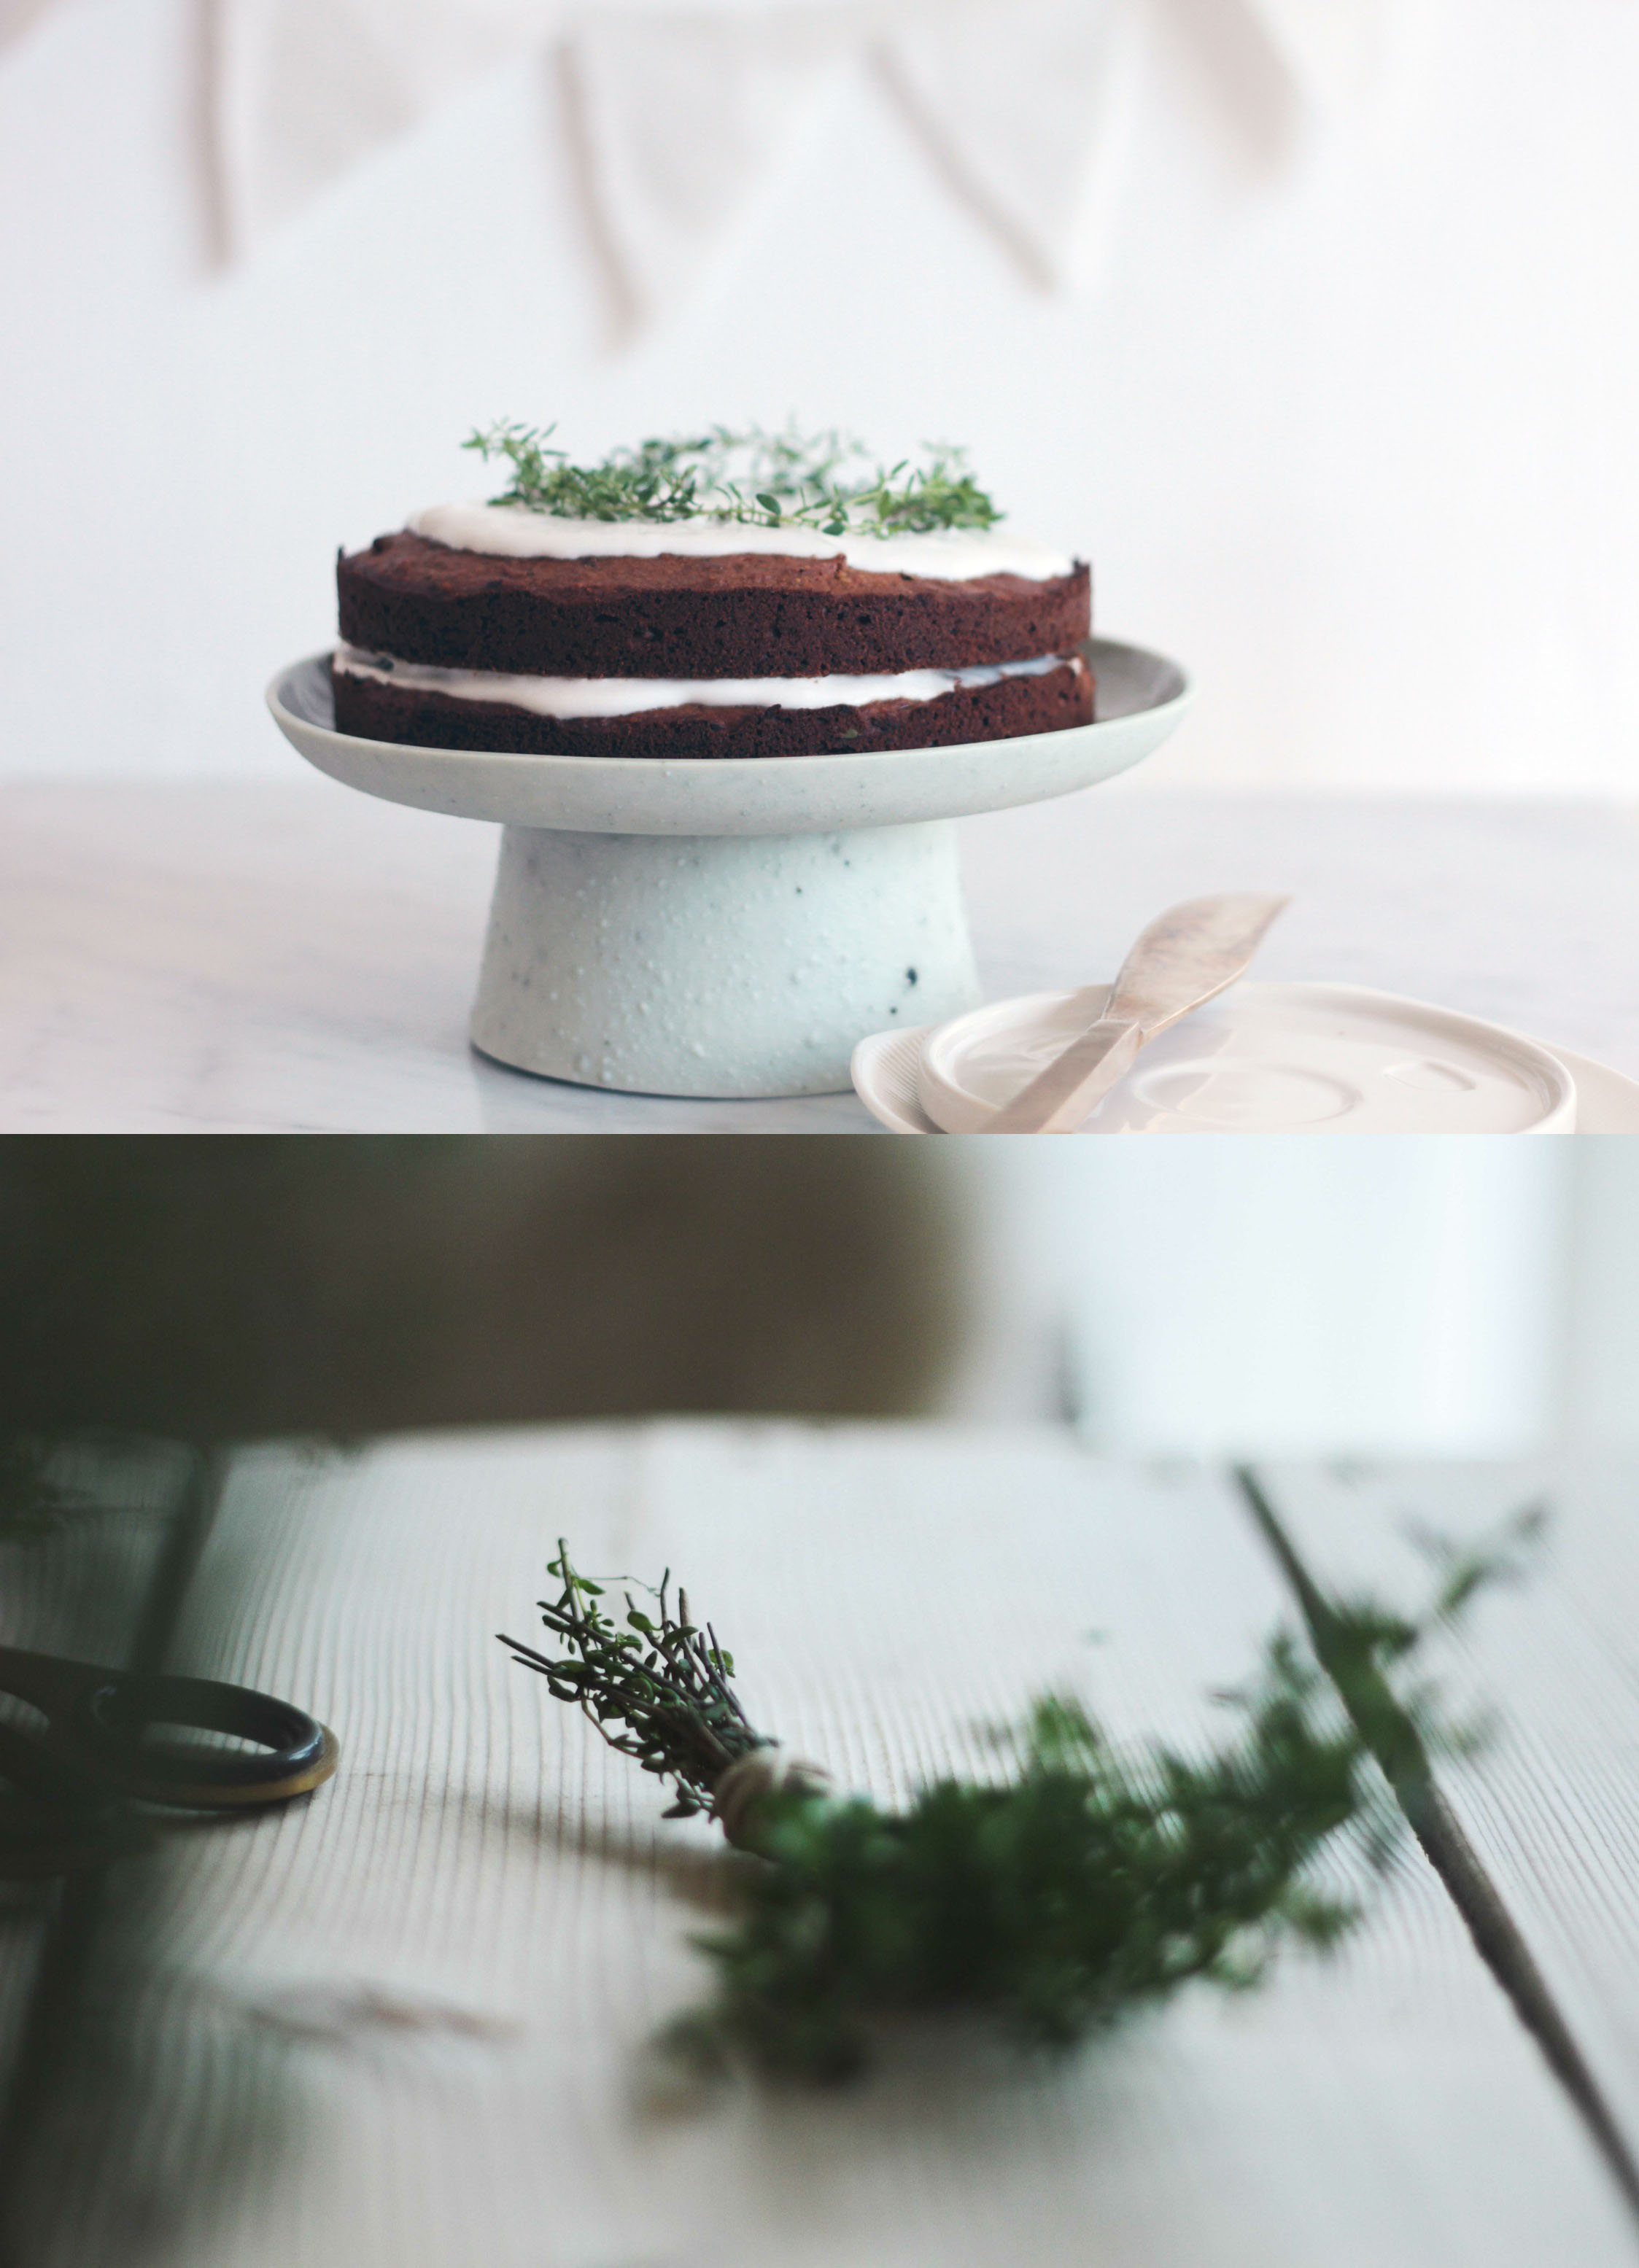 Kyra Pear Walnut Maple Birthday Cake